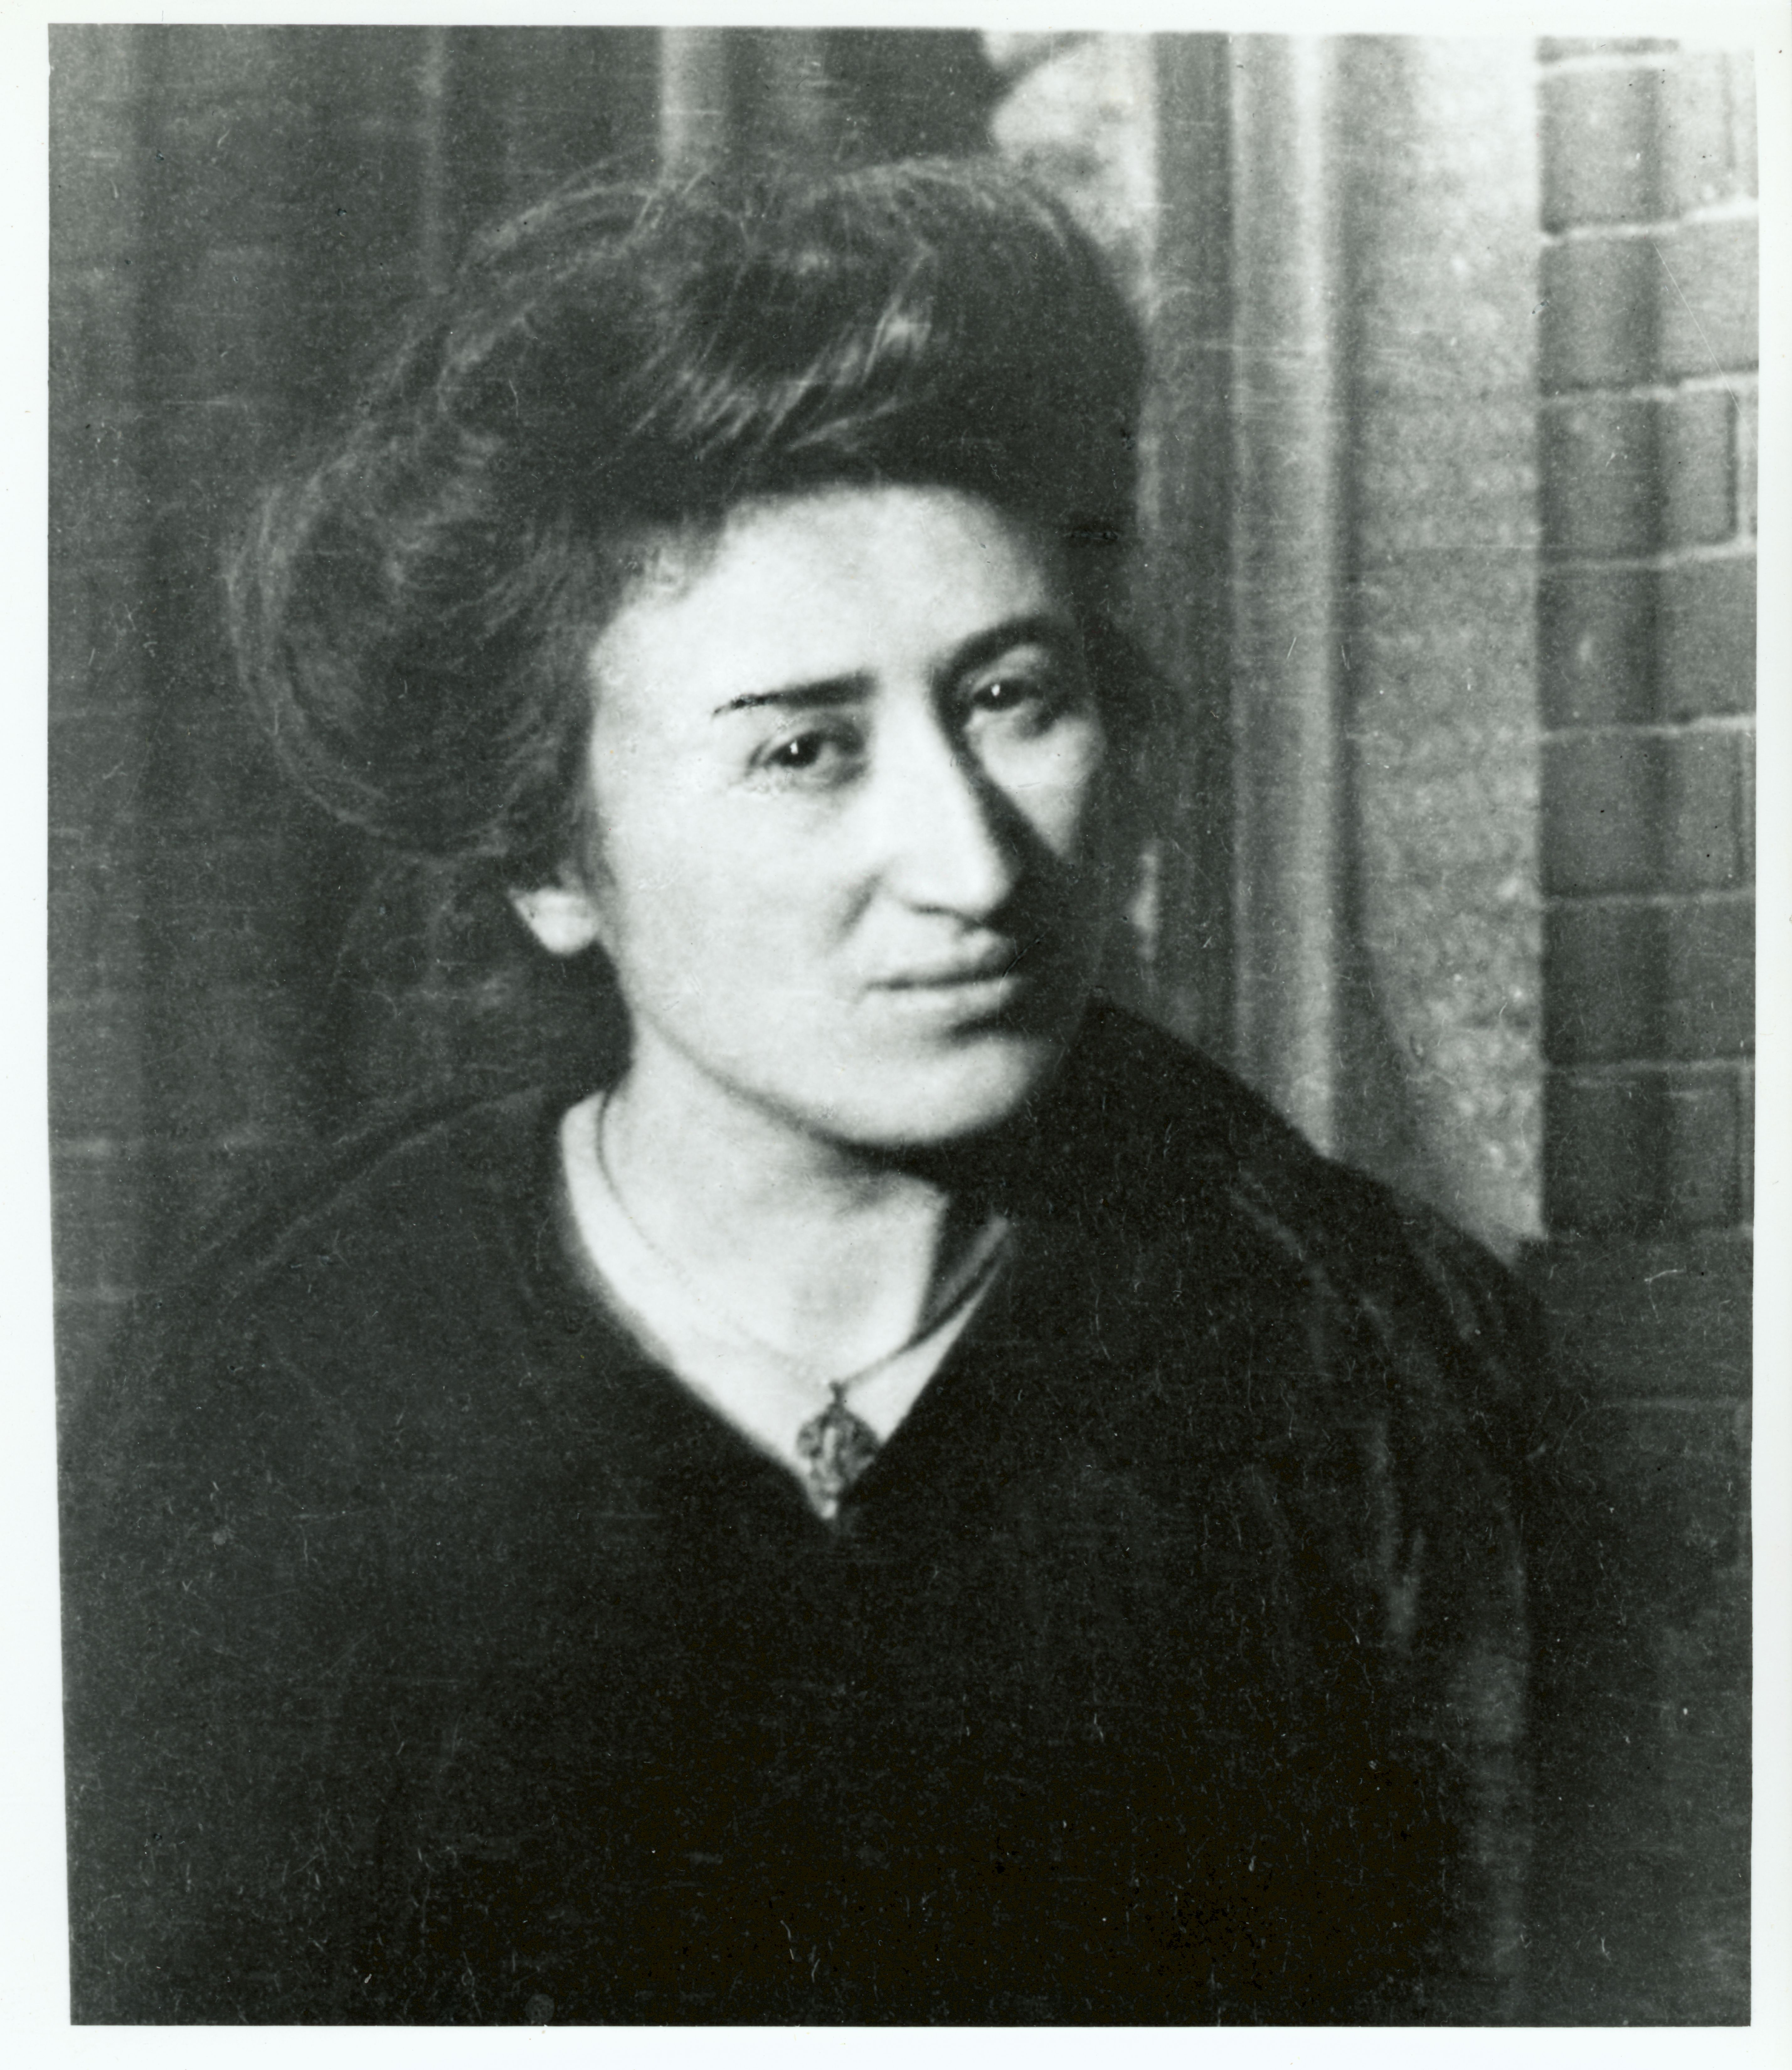 Rosa_Luxemburg-3.4